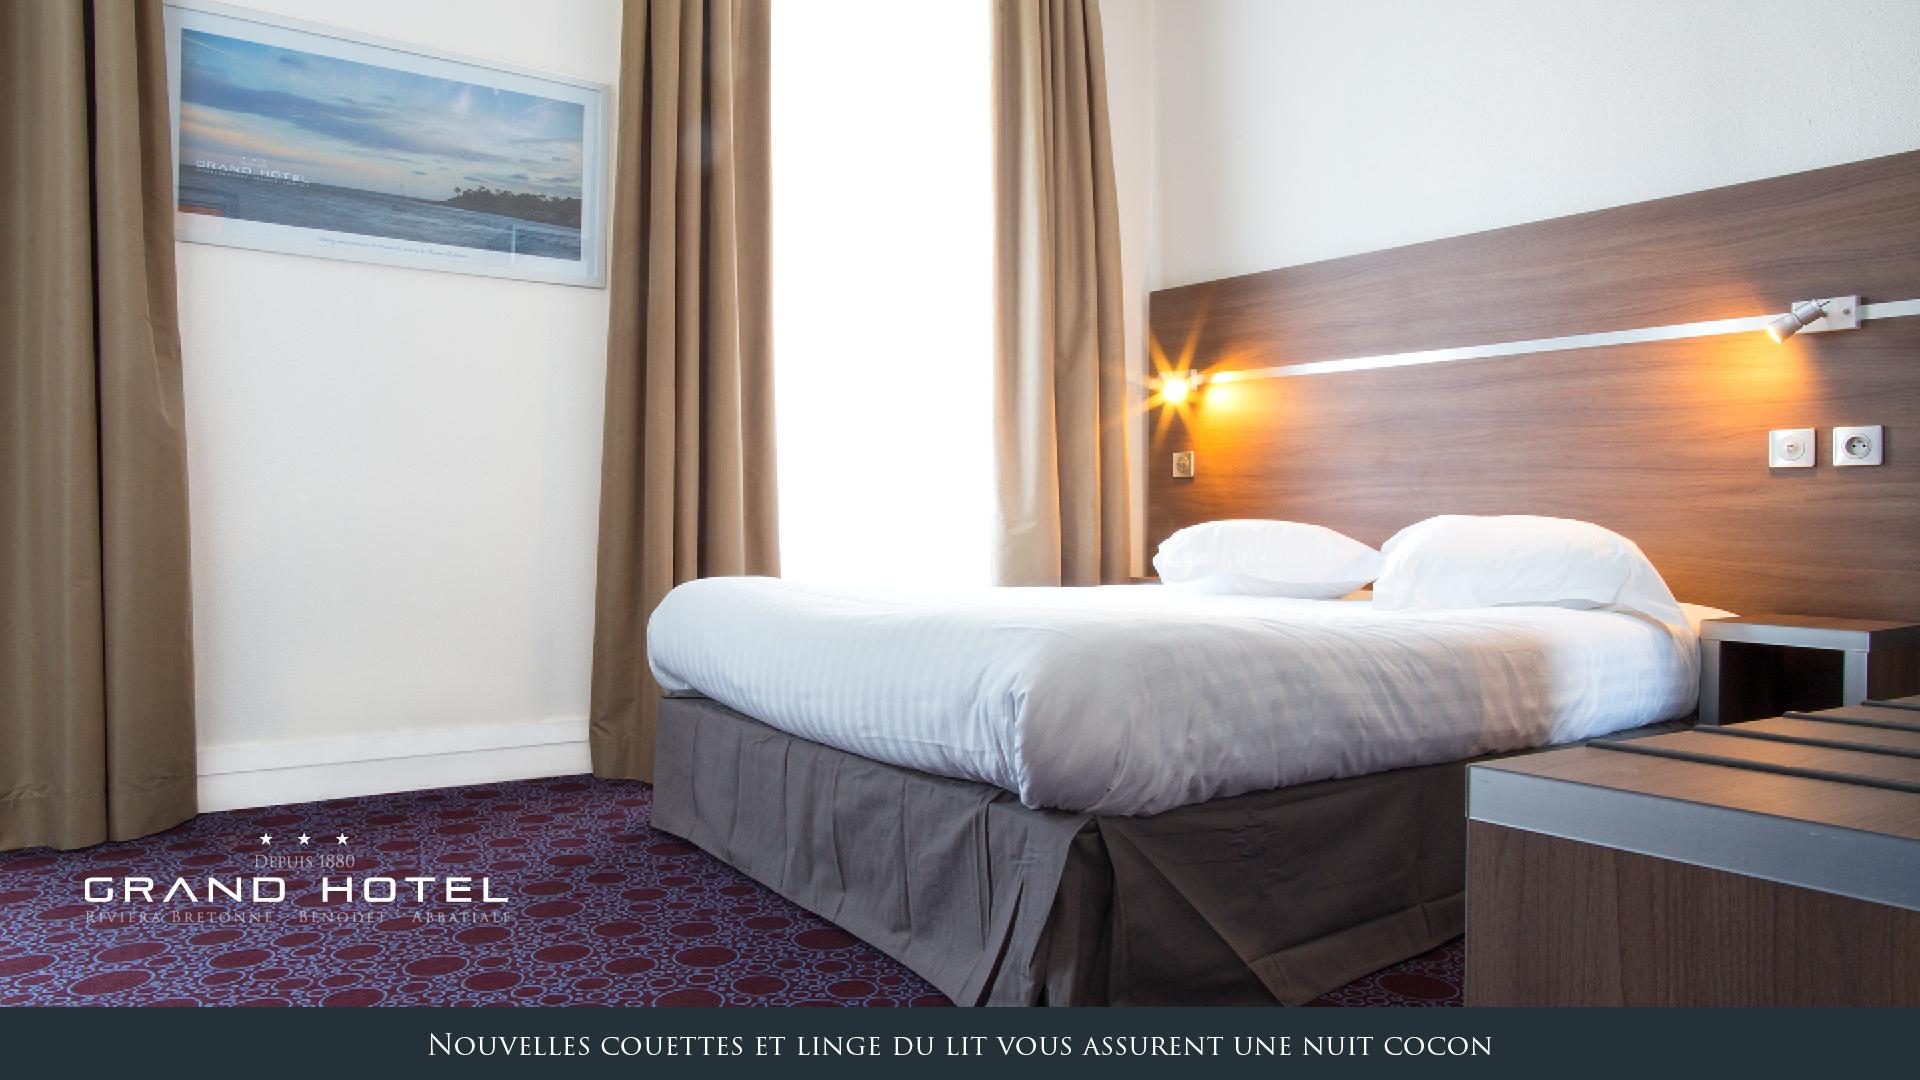 hotel 1920x1080 mai 20167GRAND HOTEL BENODET